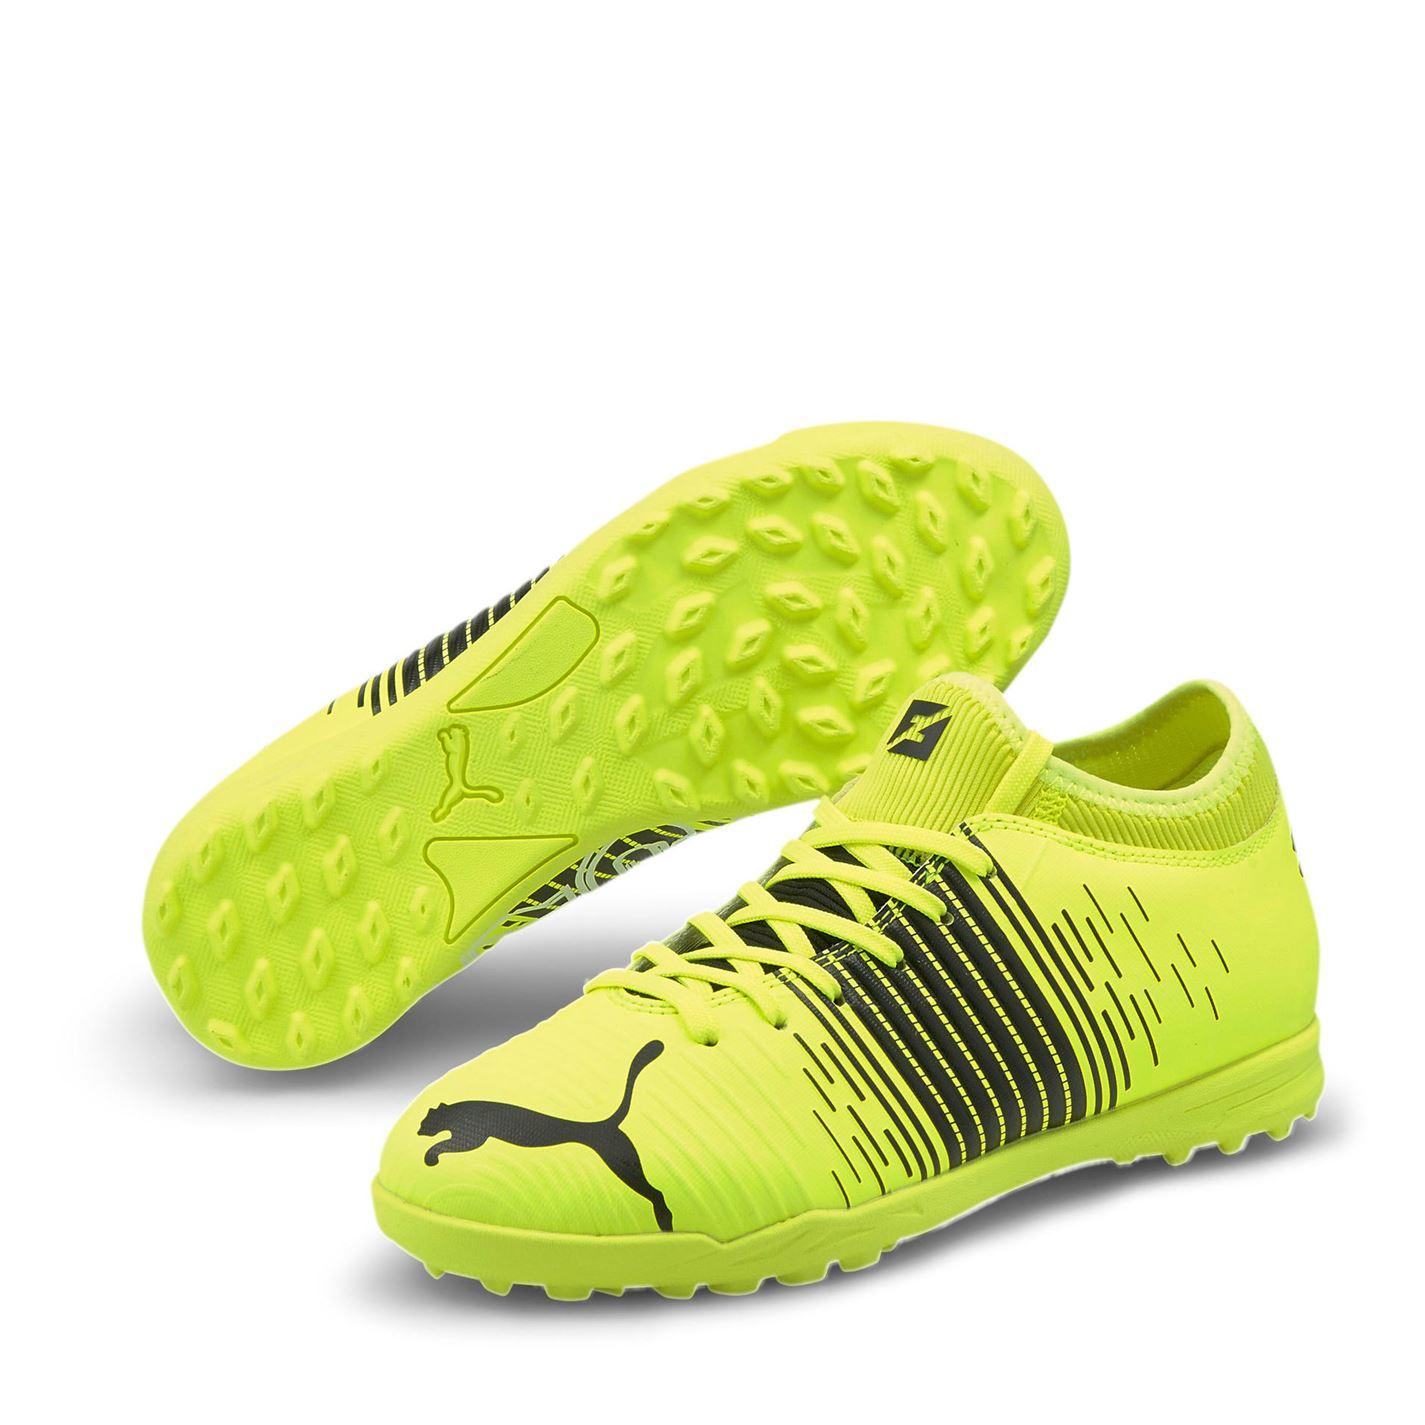 Mergi la Adidasi Gazon Sintetic Puma Future Z 4.1 pentru copii galben negru